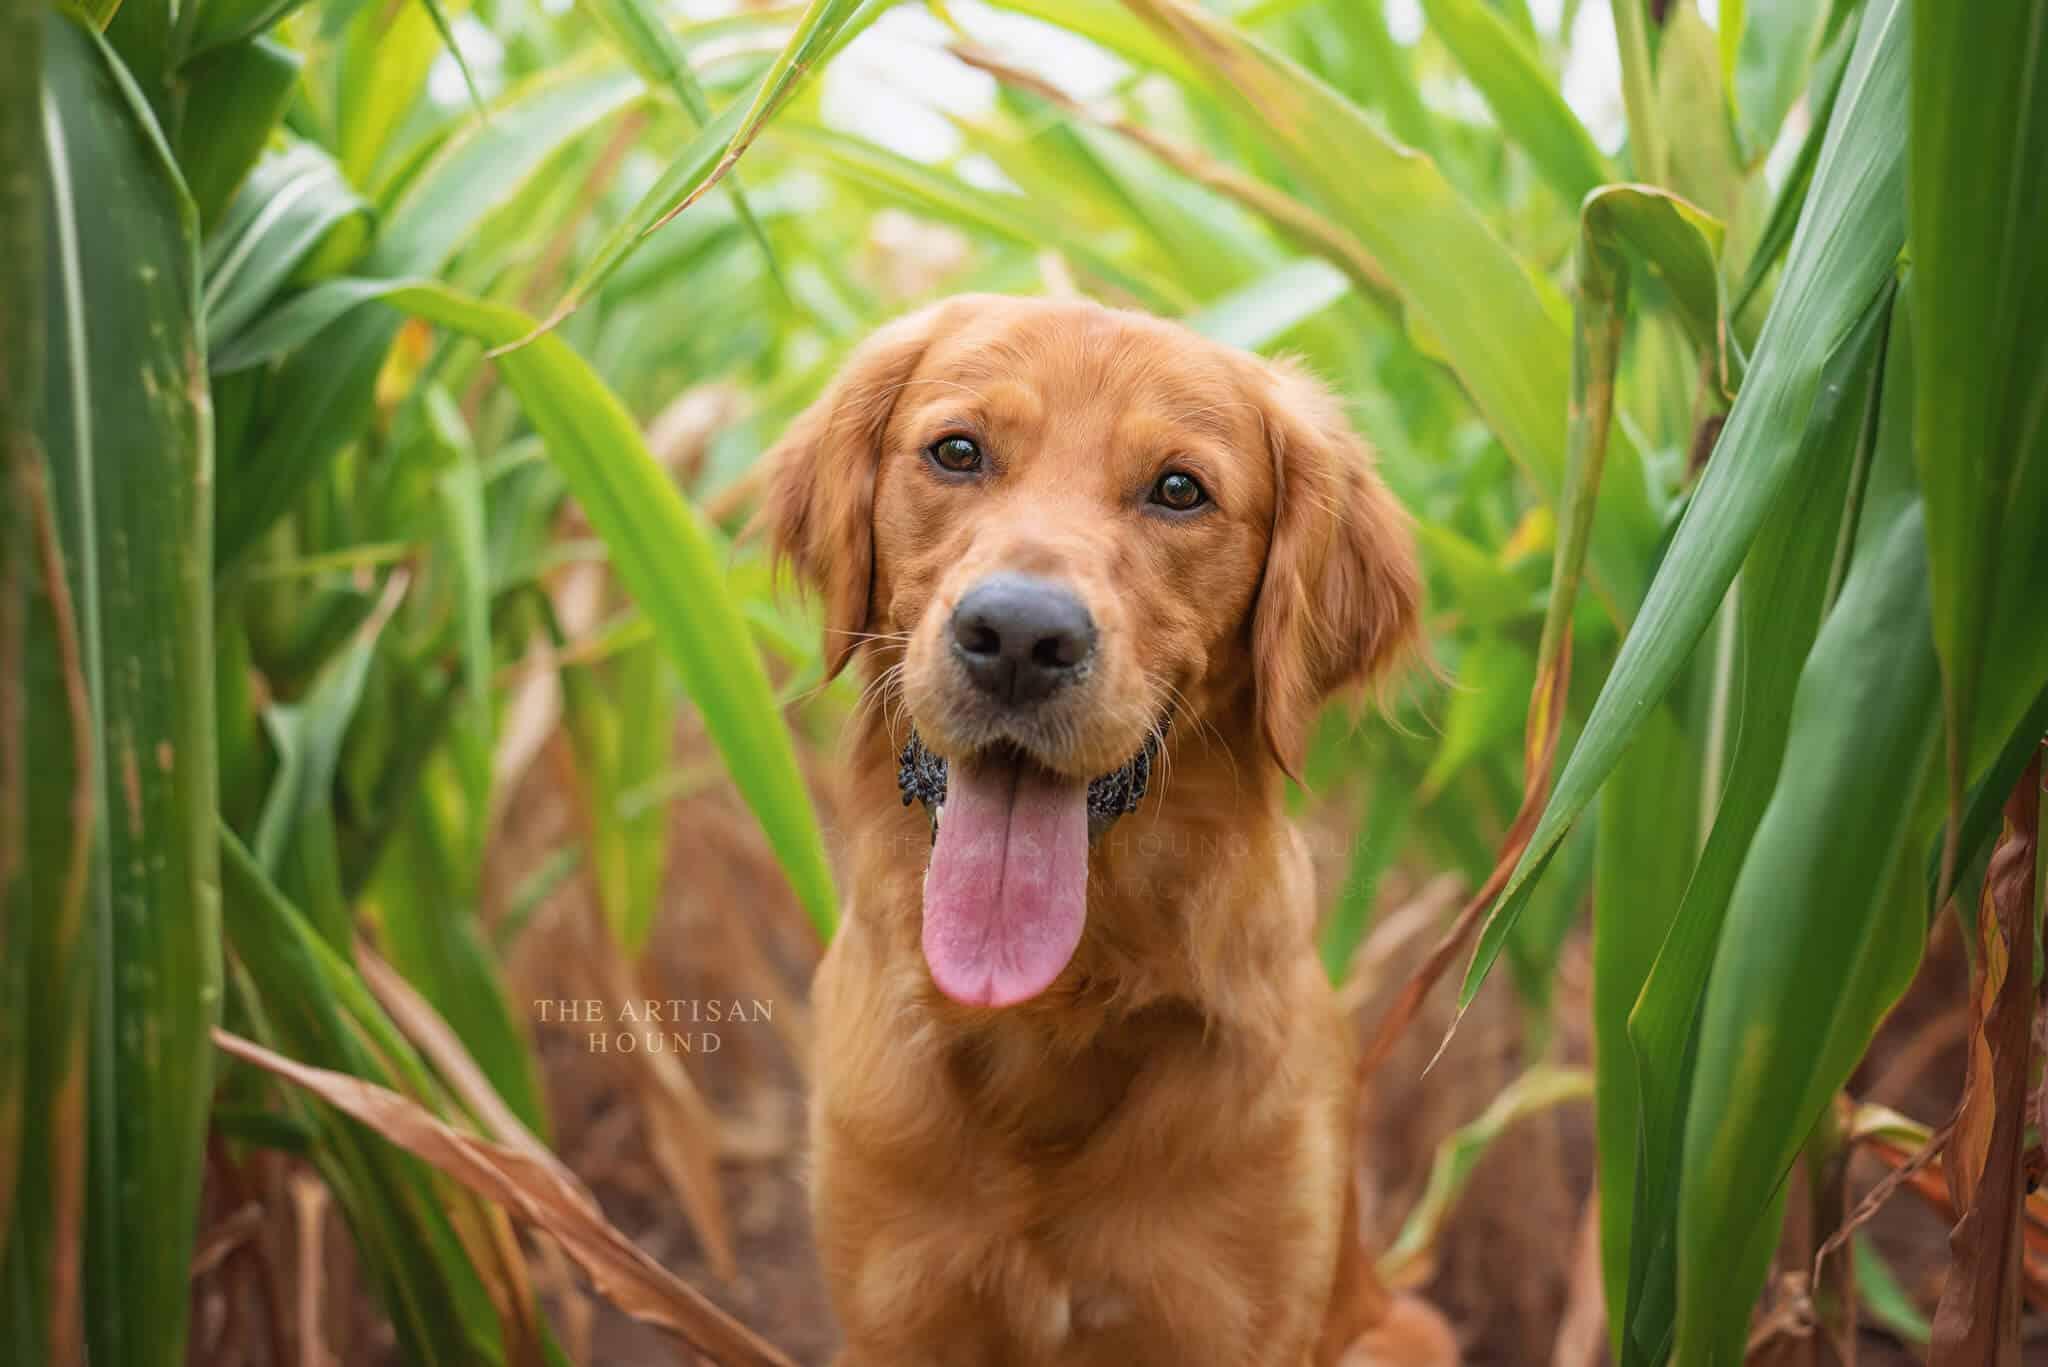 Golden Retriever dog standing in cornfield